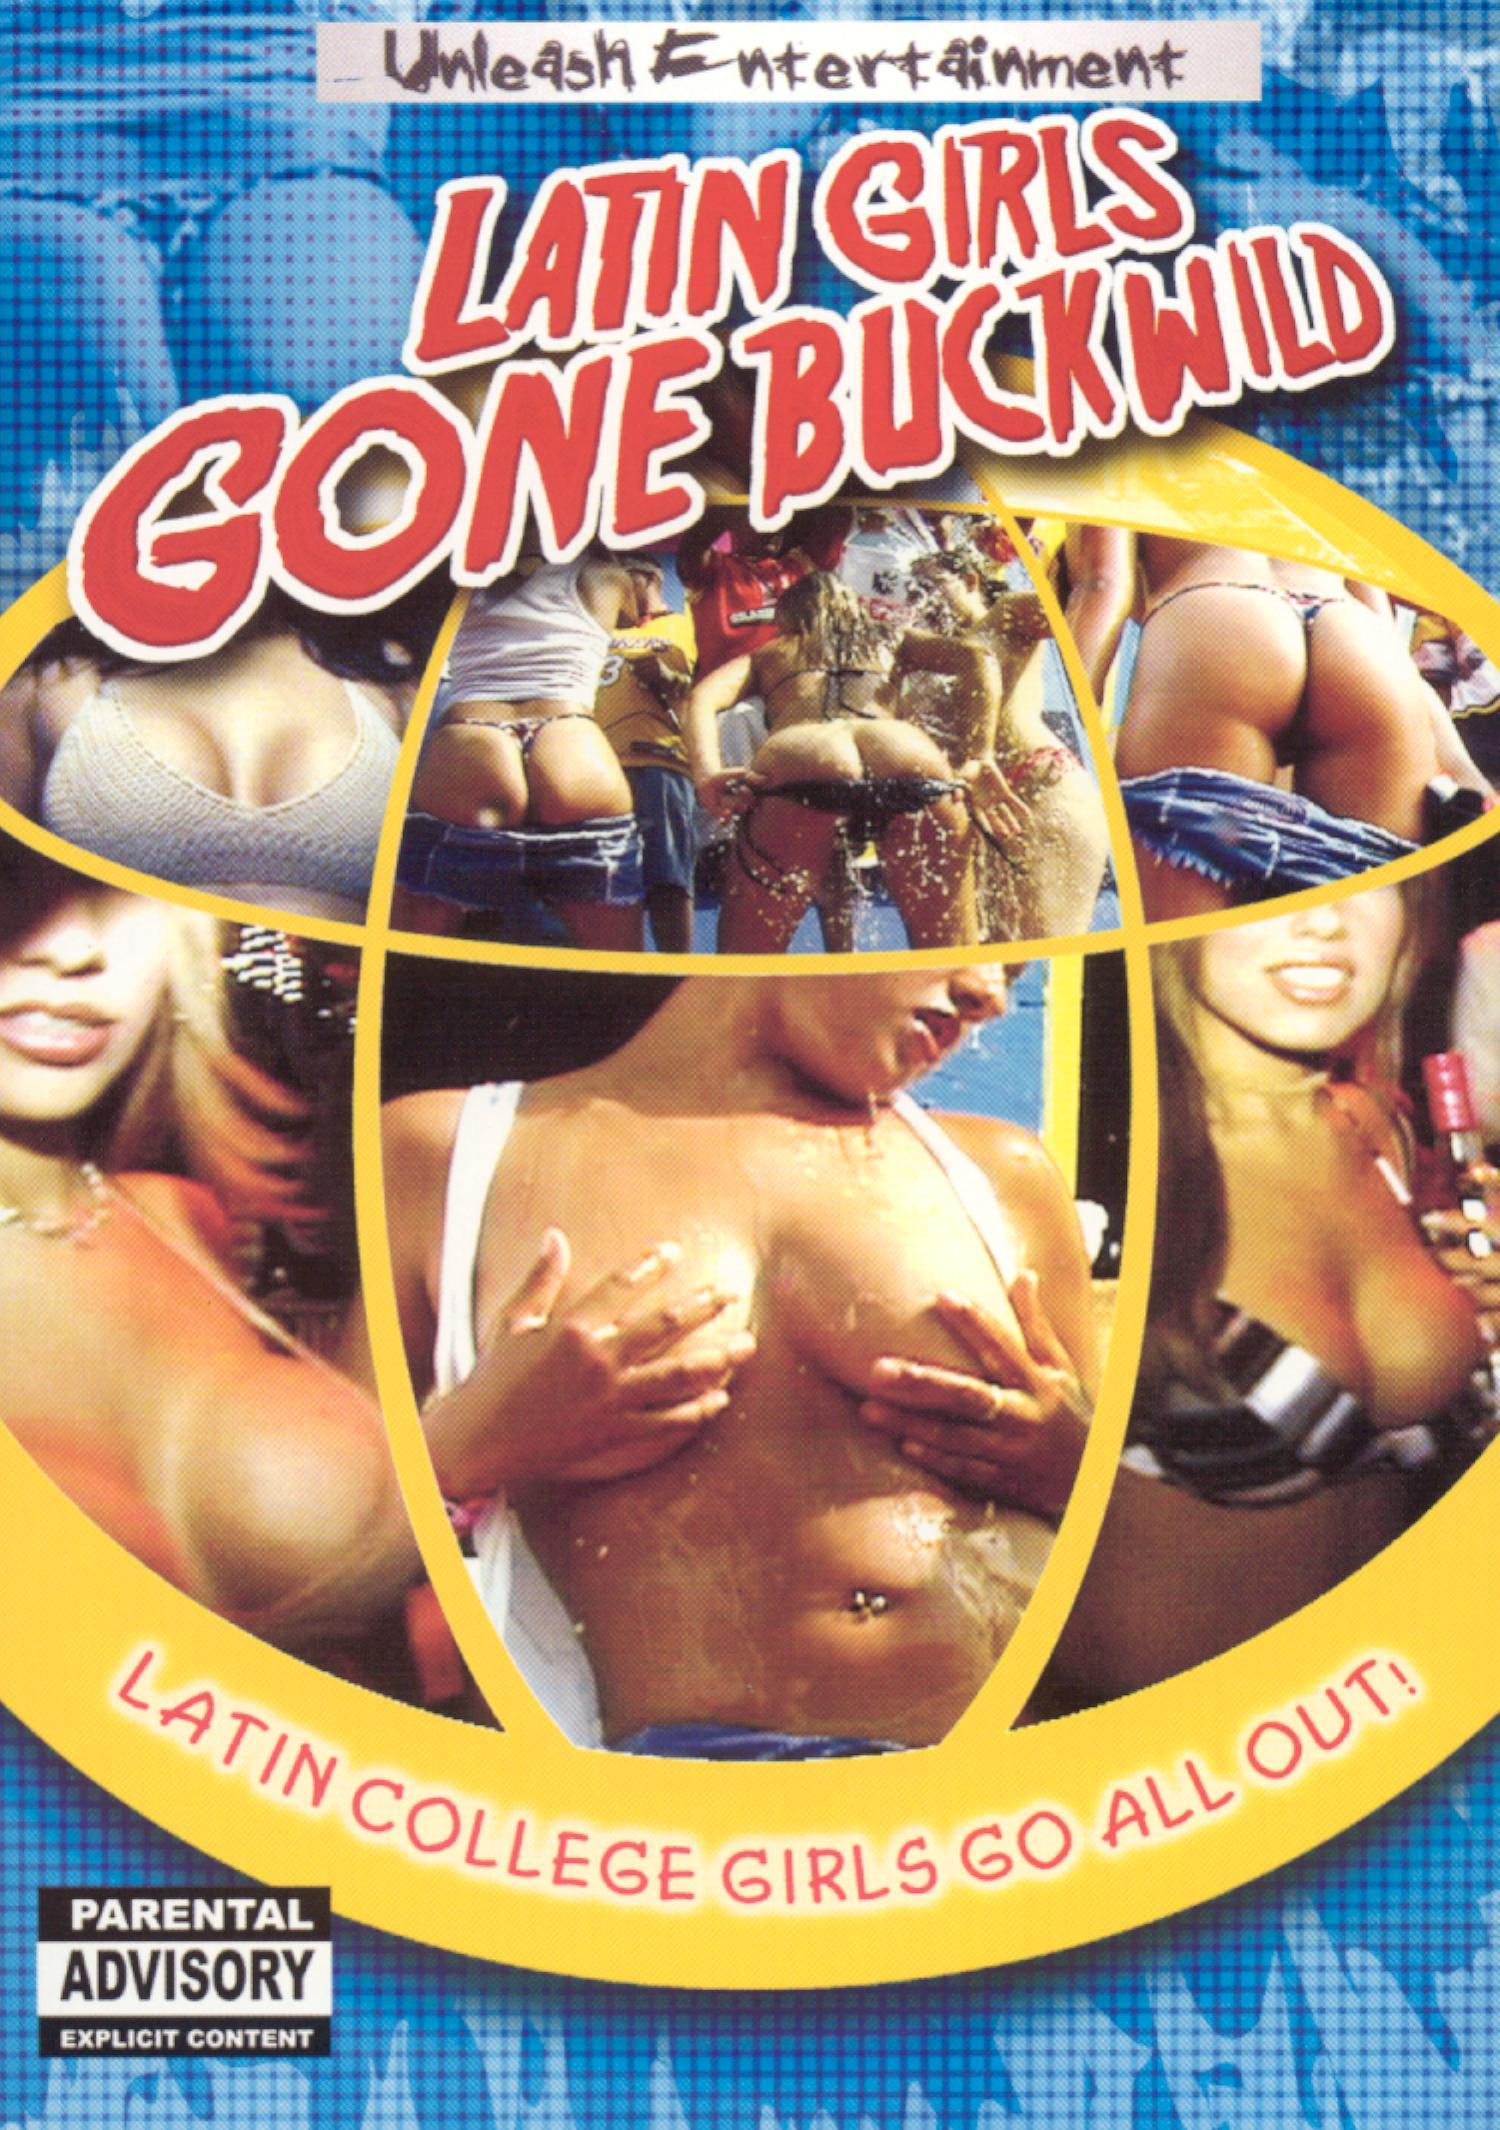 Latin Girls Gone Buckwild